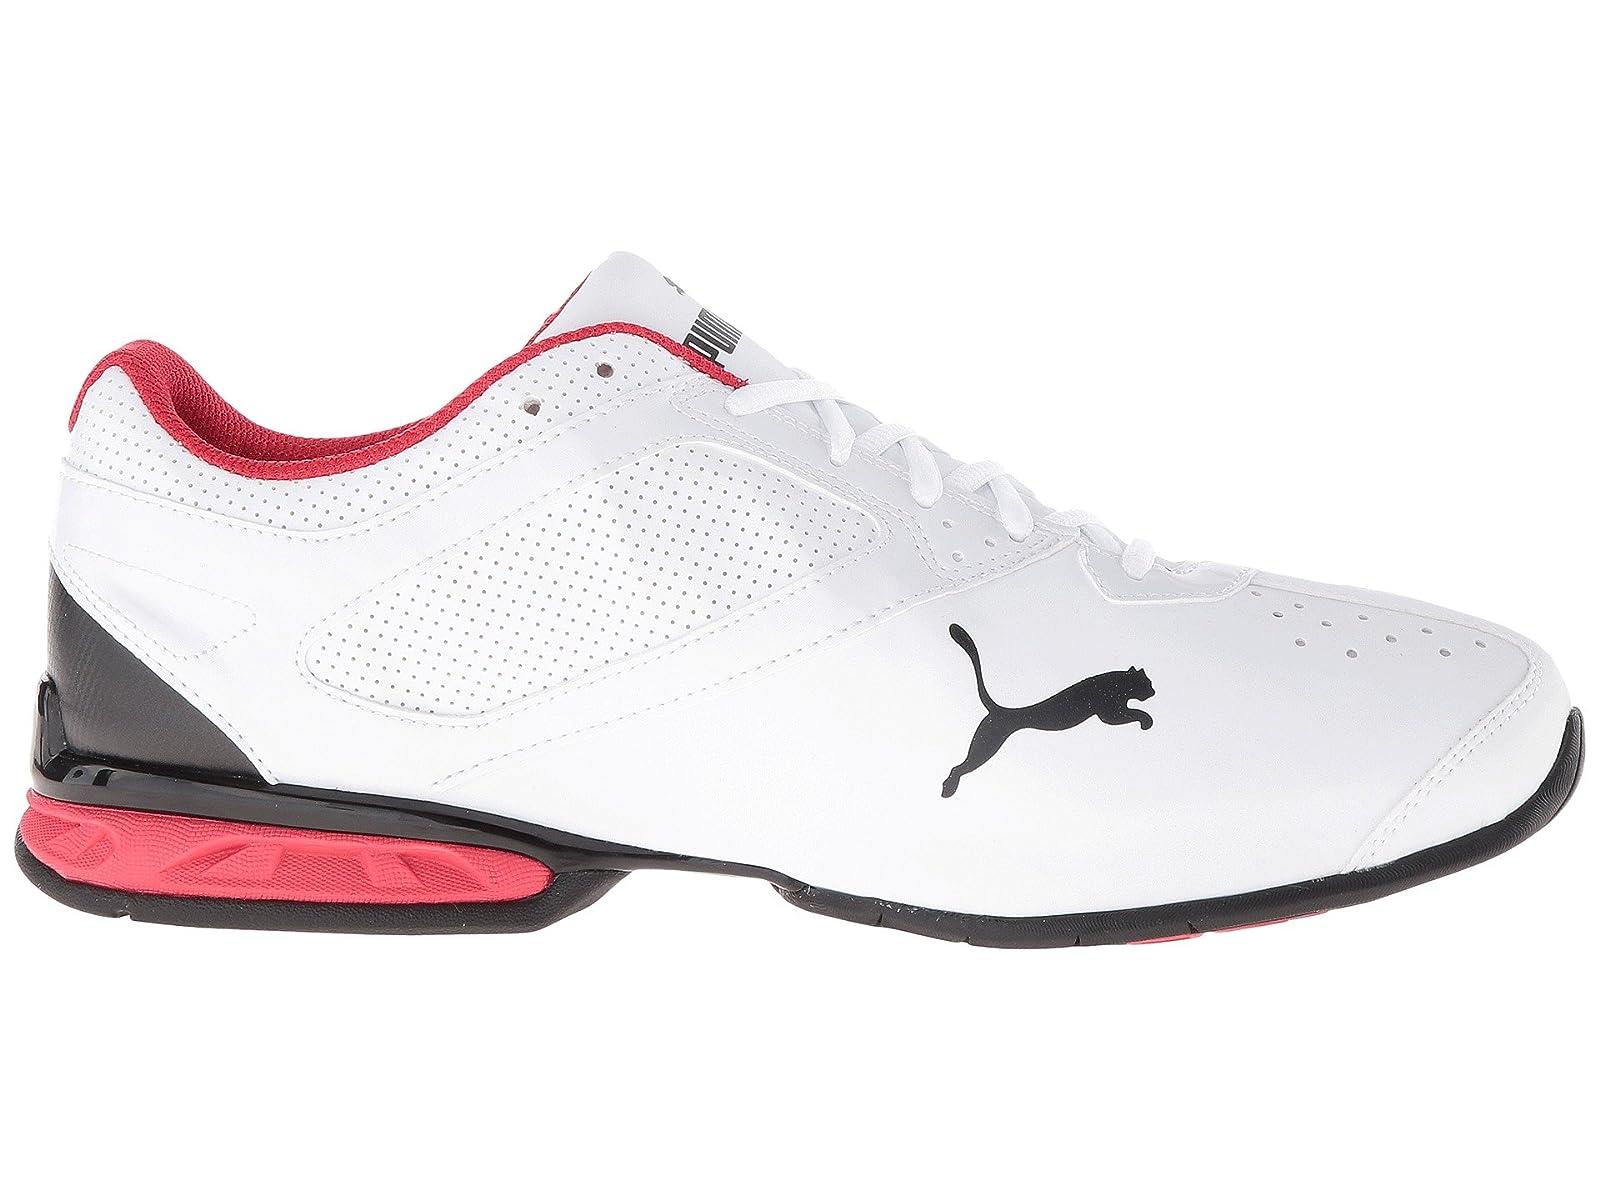 Men-039-s-Scarpe-Da-Ginnastica-amp-Athletic-Shoes-Puma-Tazon-6-FM miniatura 21